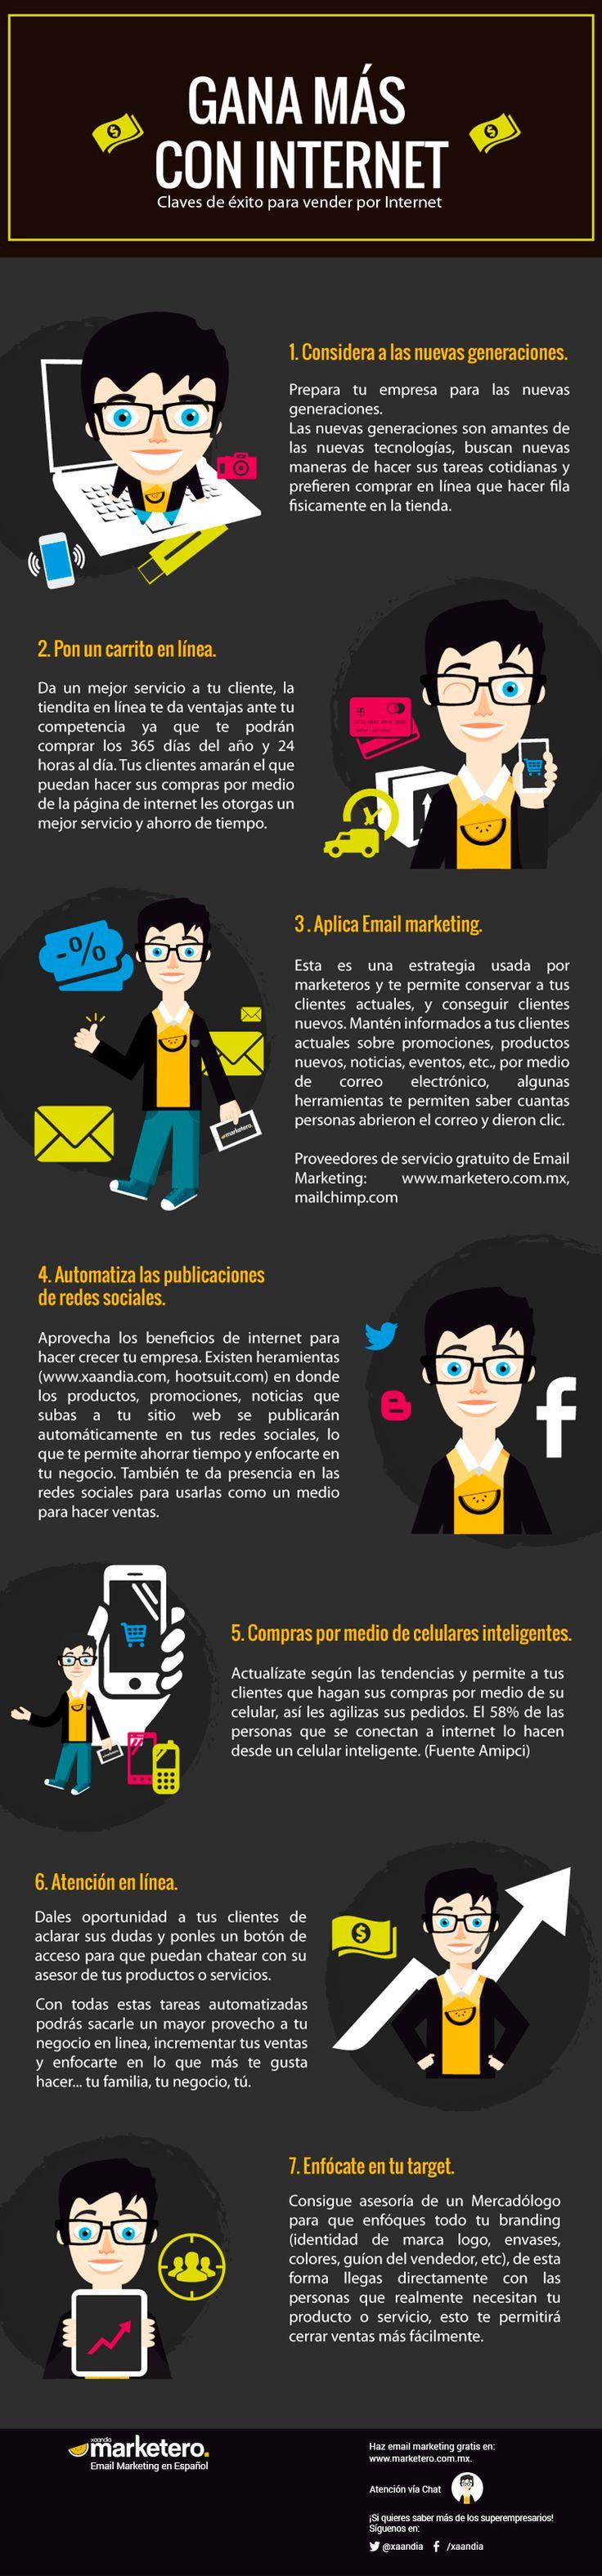 7 claves para vender por Internet #infografia #infographic #marketing | TICs y Formació